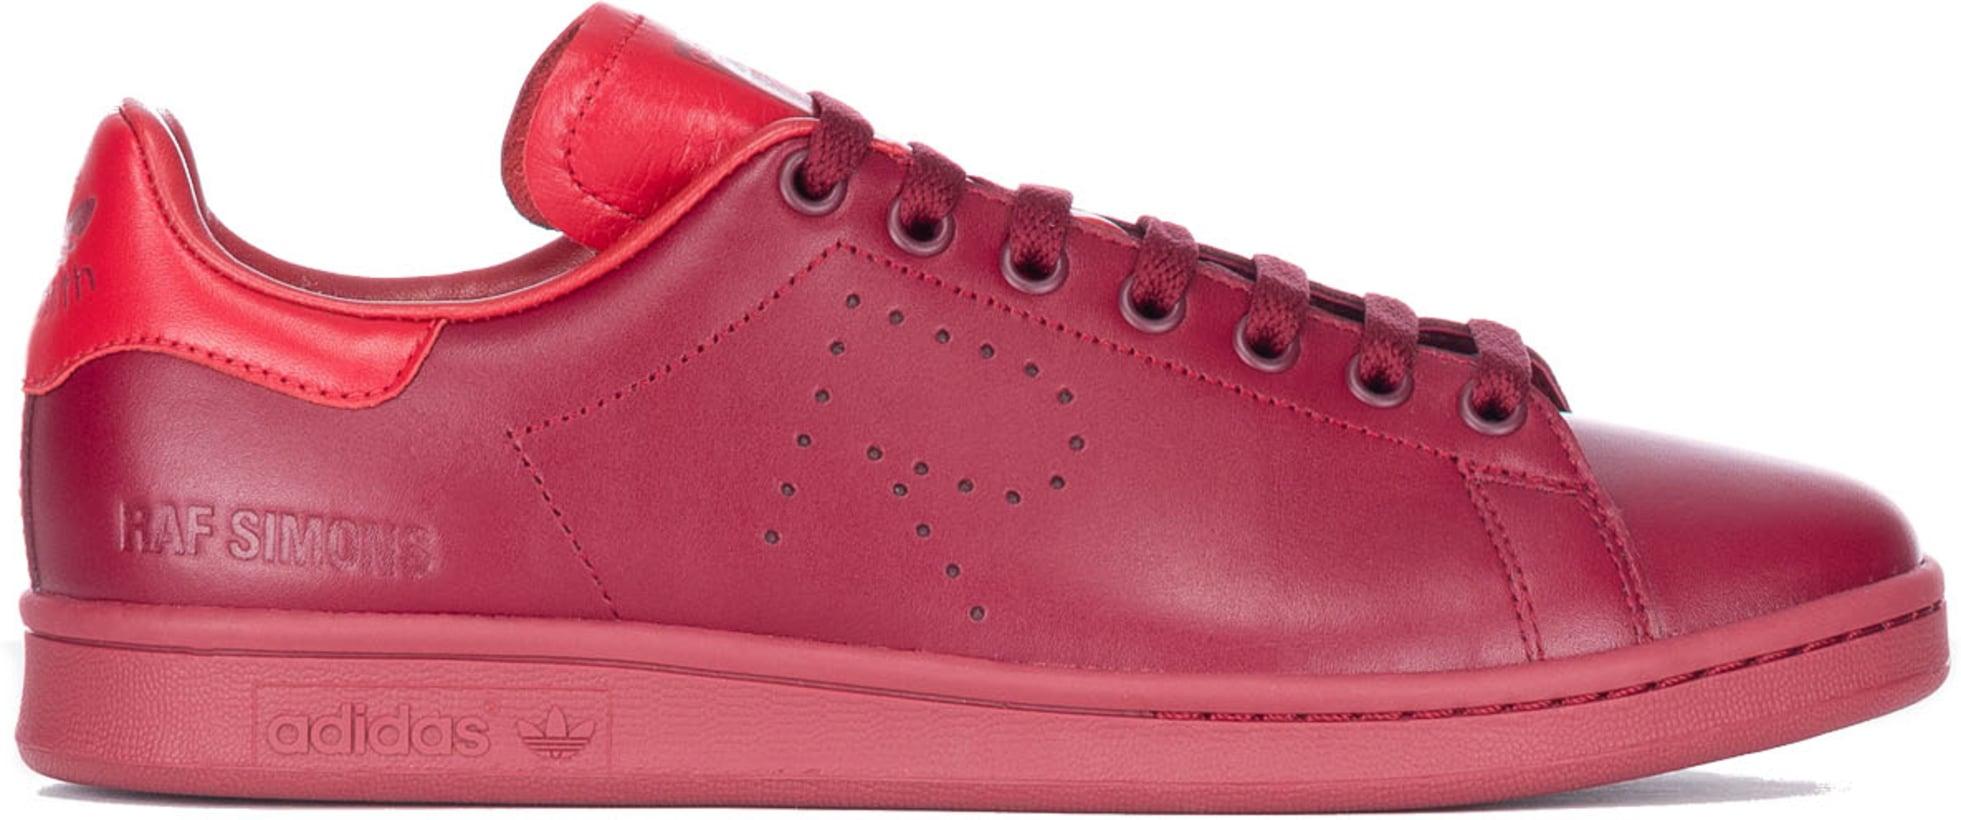 on sale 72093 2eb18 adidas by raf simons stan smith off